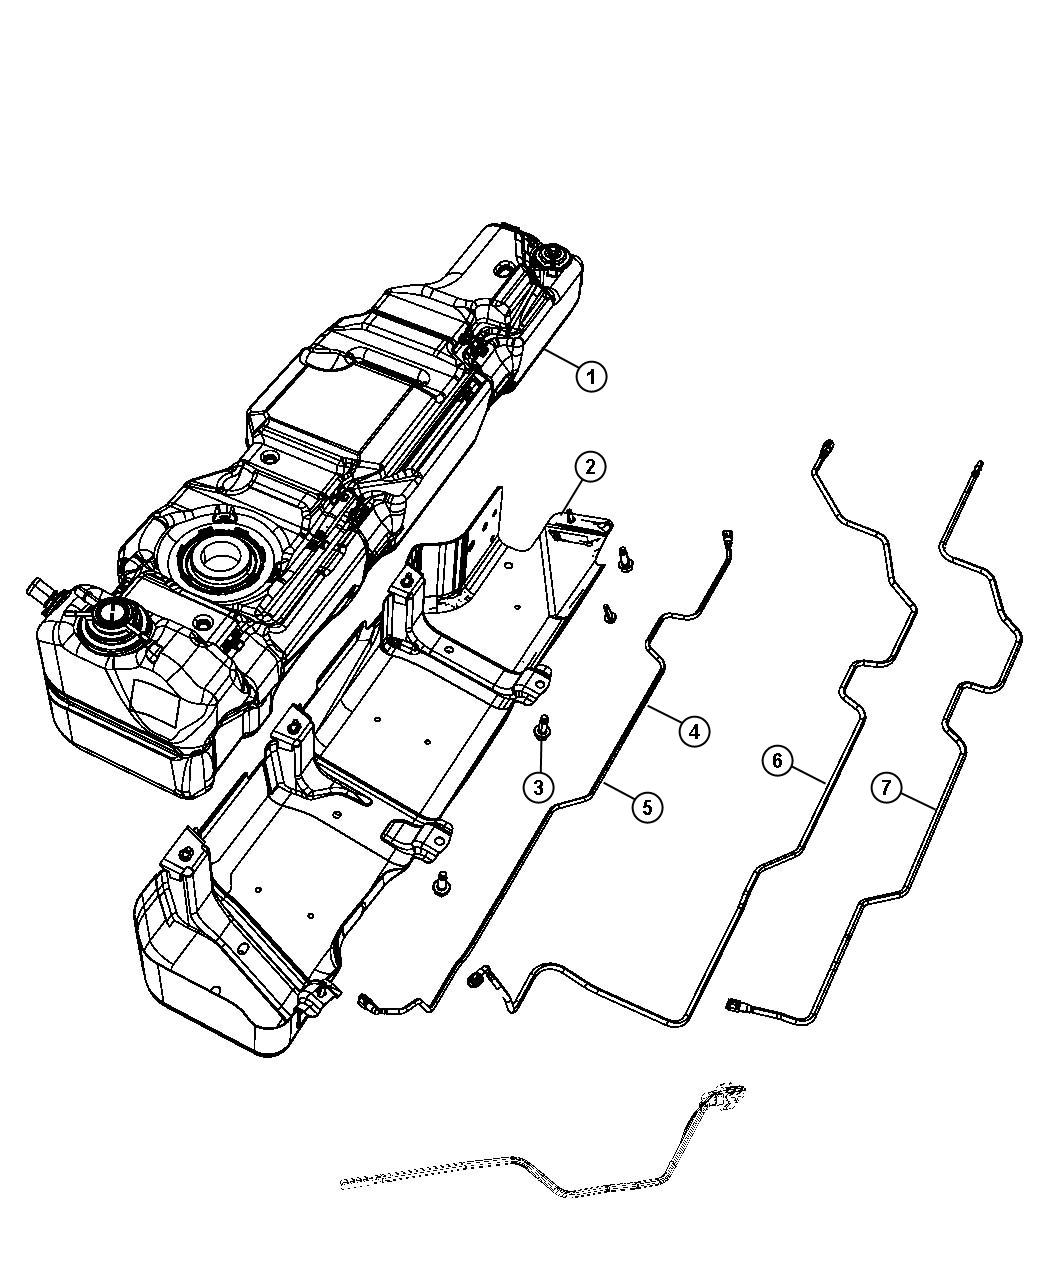 Jeep Wrangler Tube Canister Purge 22 5 Gallon Fuel Tank